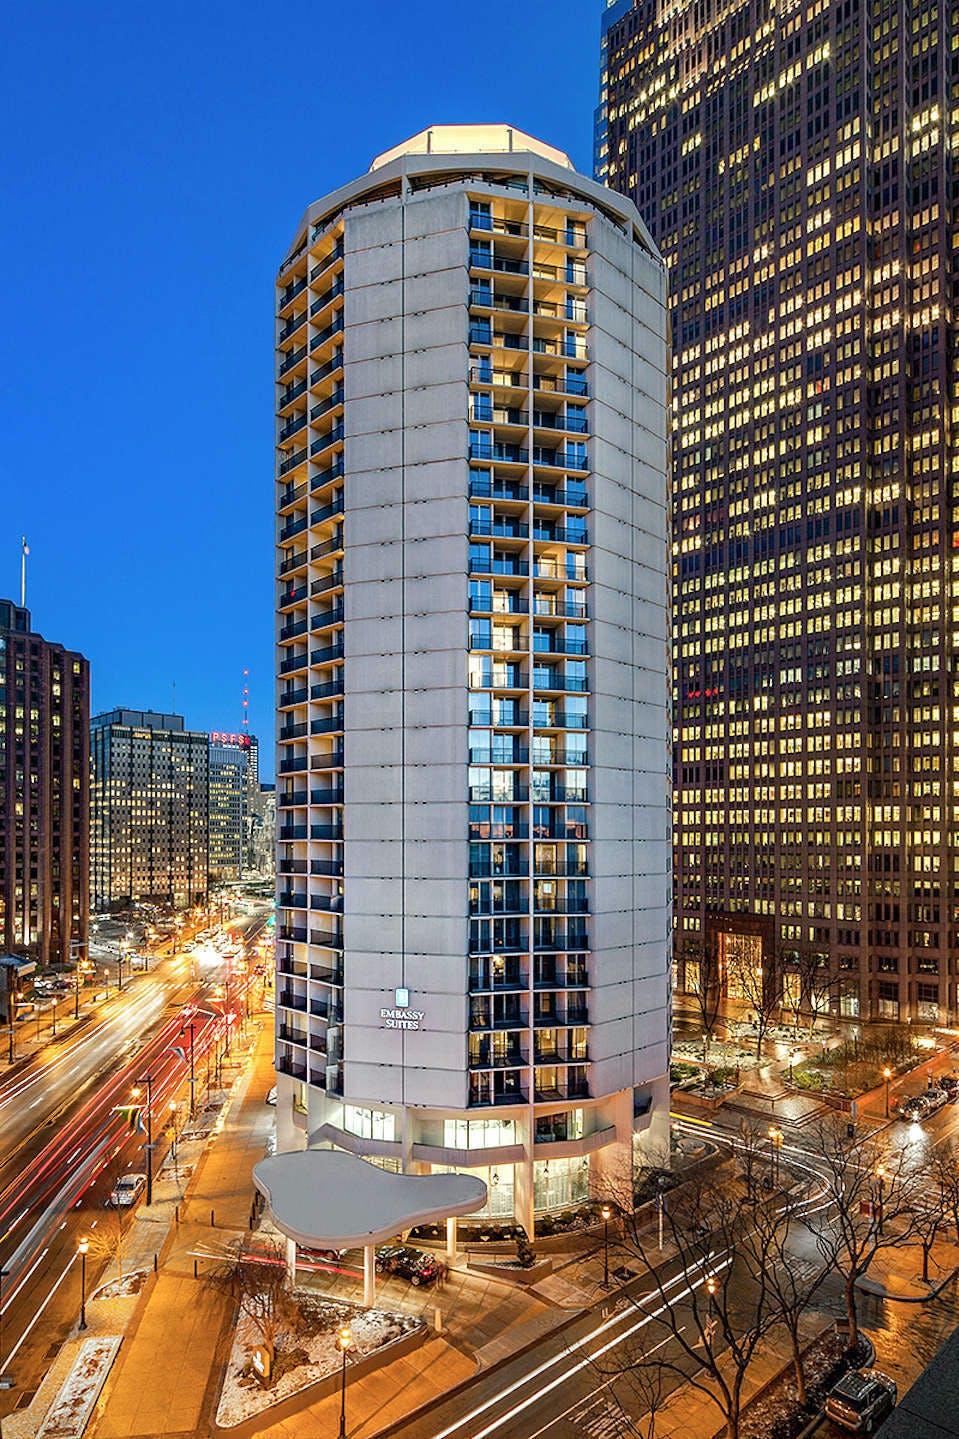 Embassy Suites Philadelphia - Center City